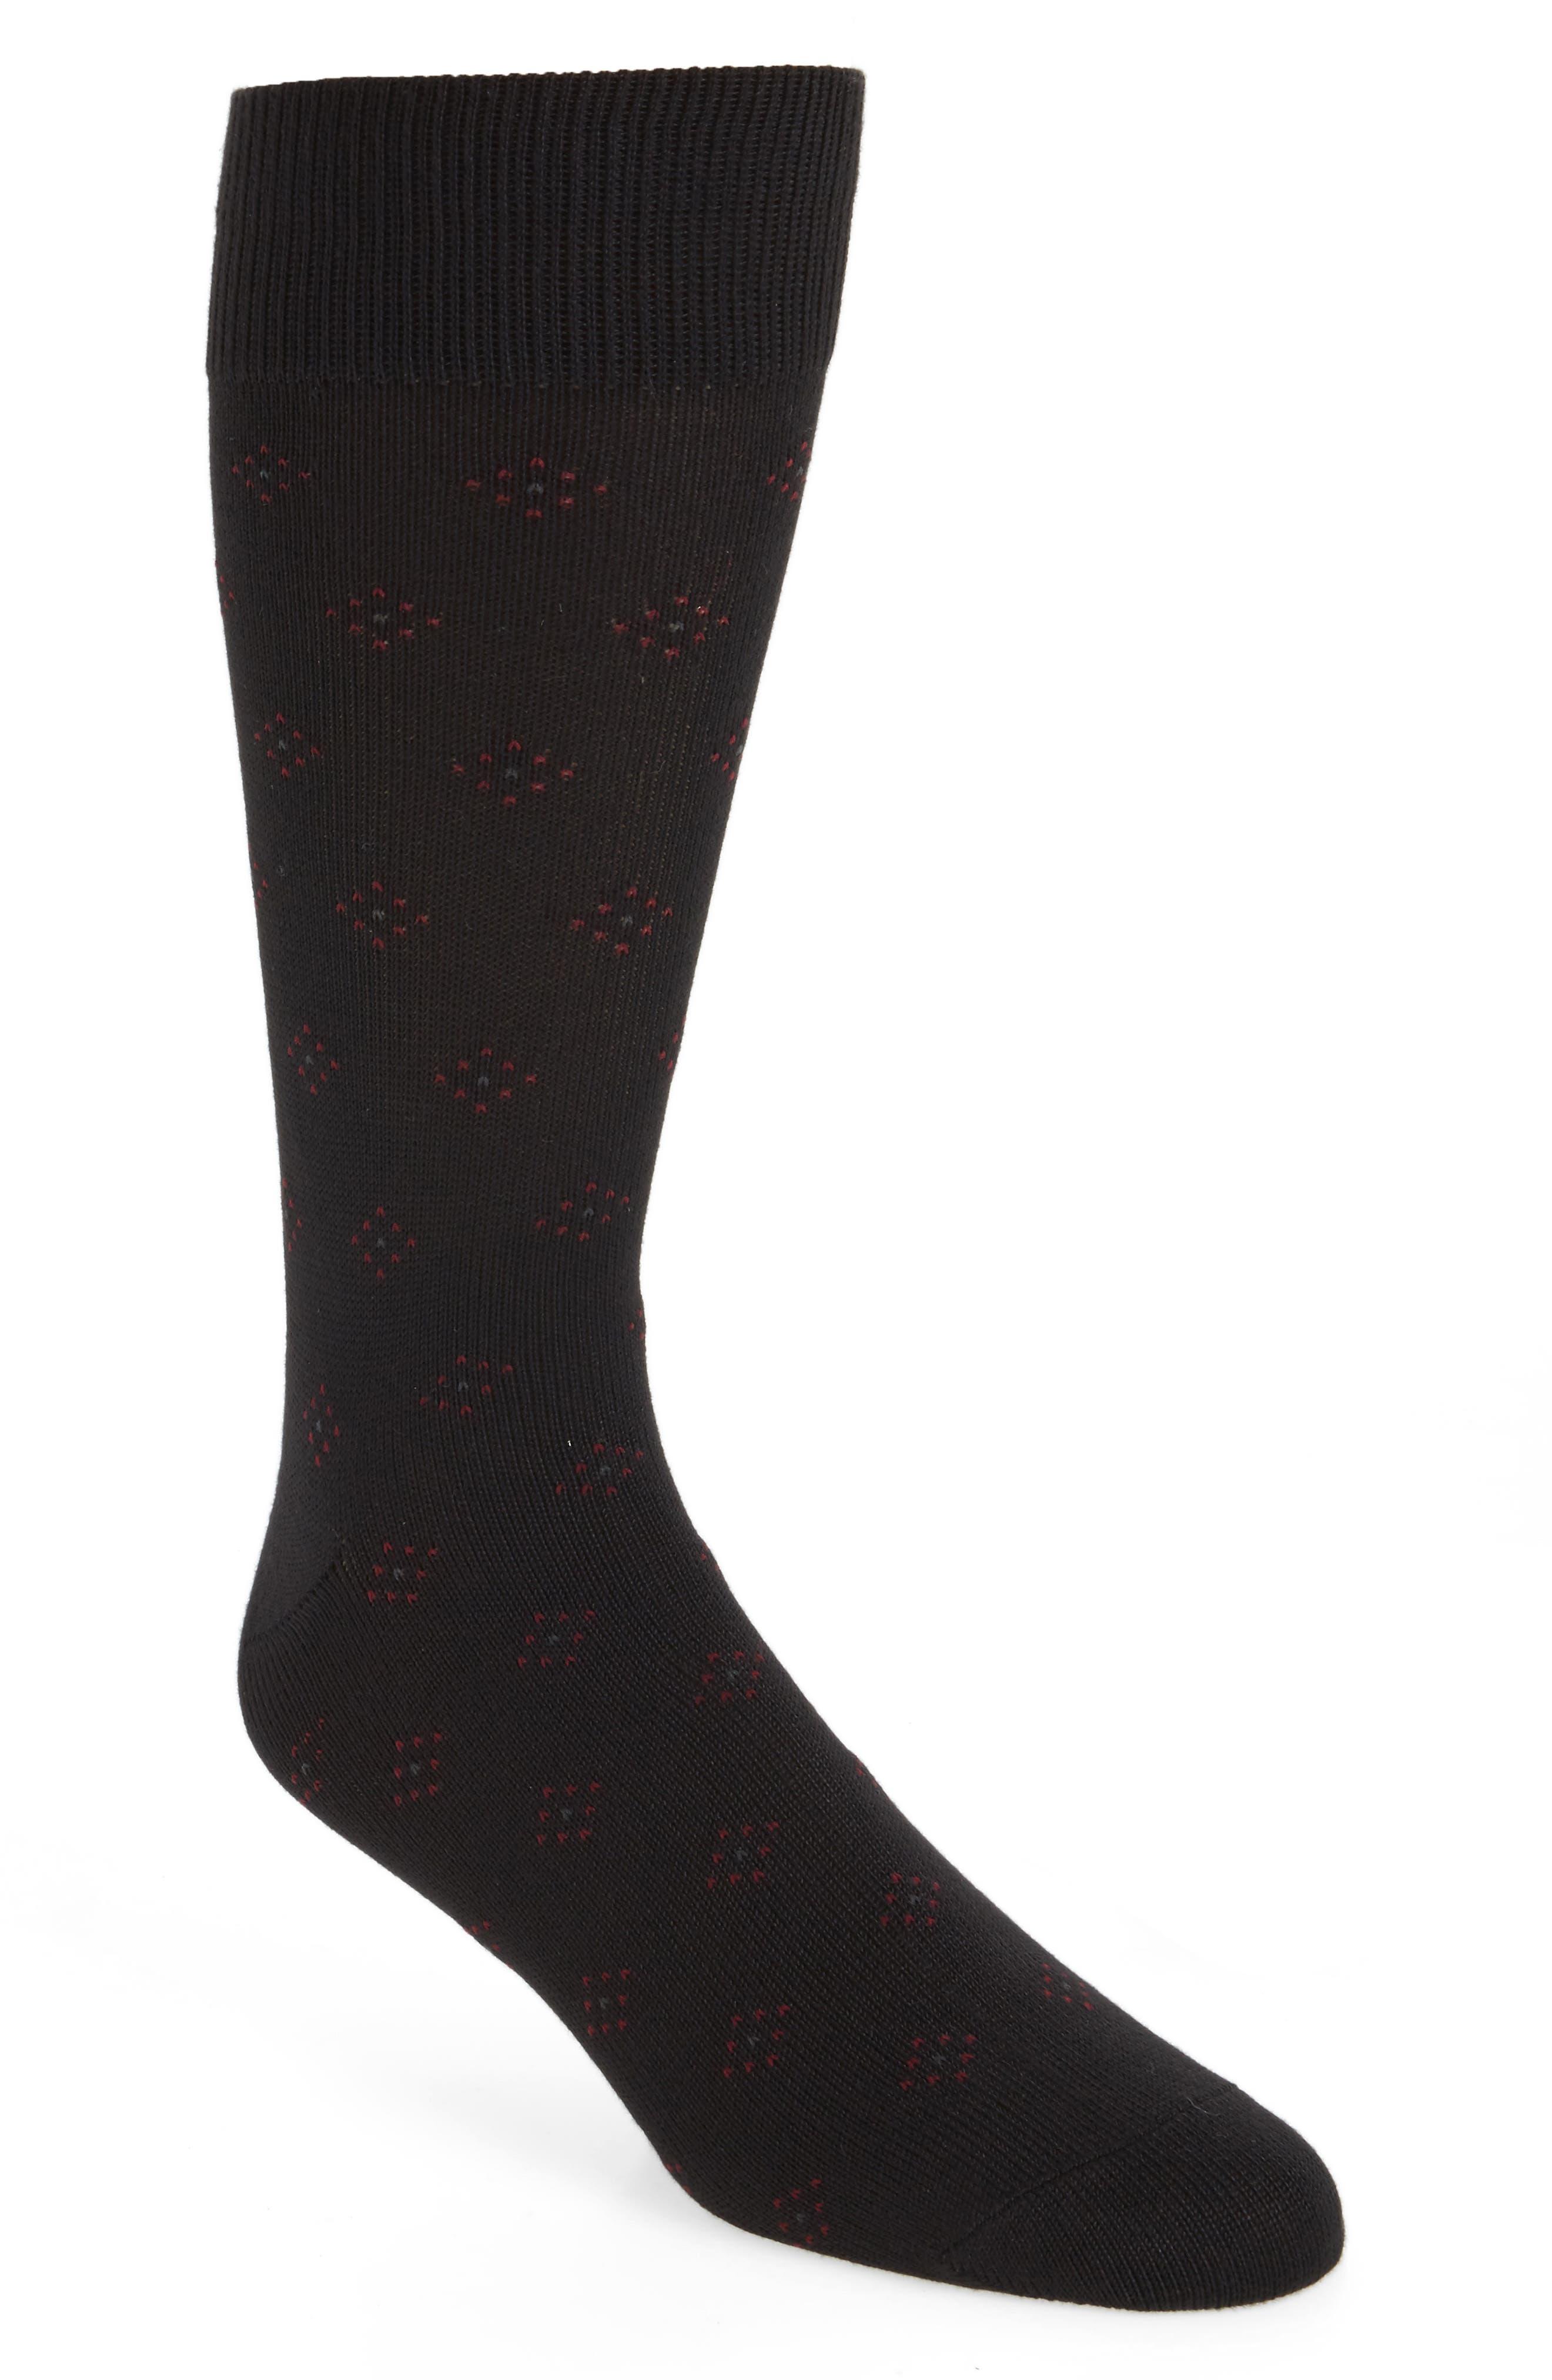 Ultra Soft Neat Socks,                             Main thumbnail 1, color,                             Black